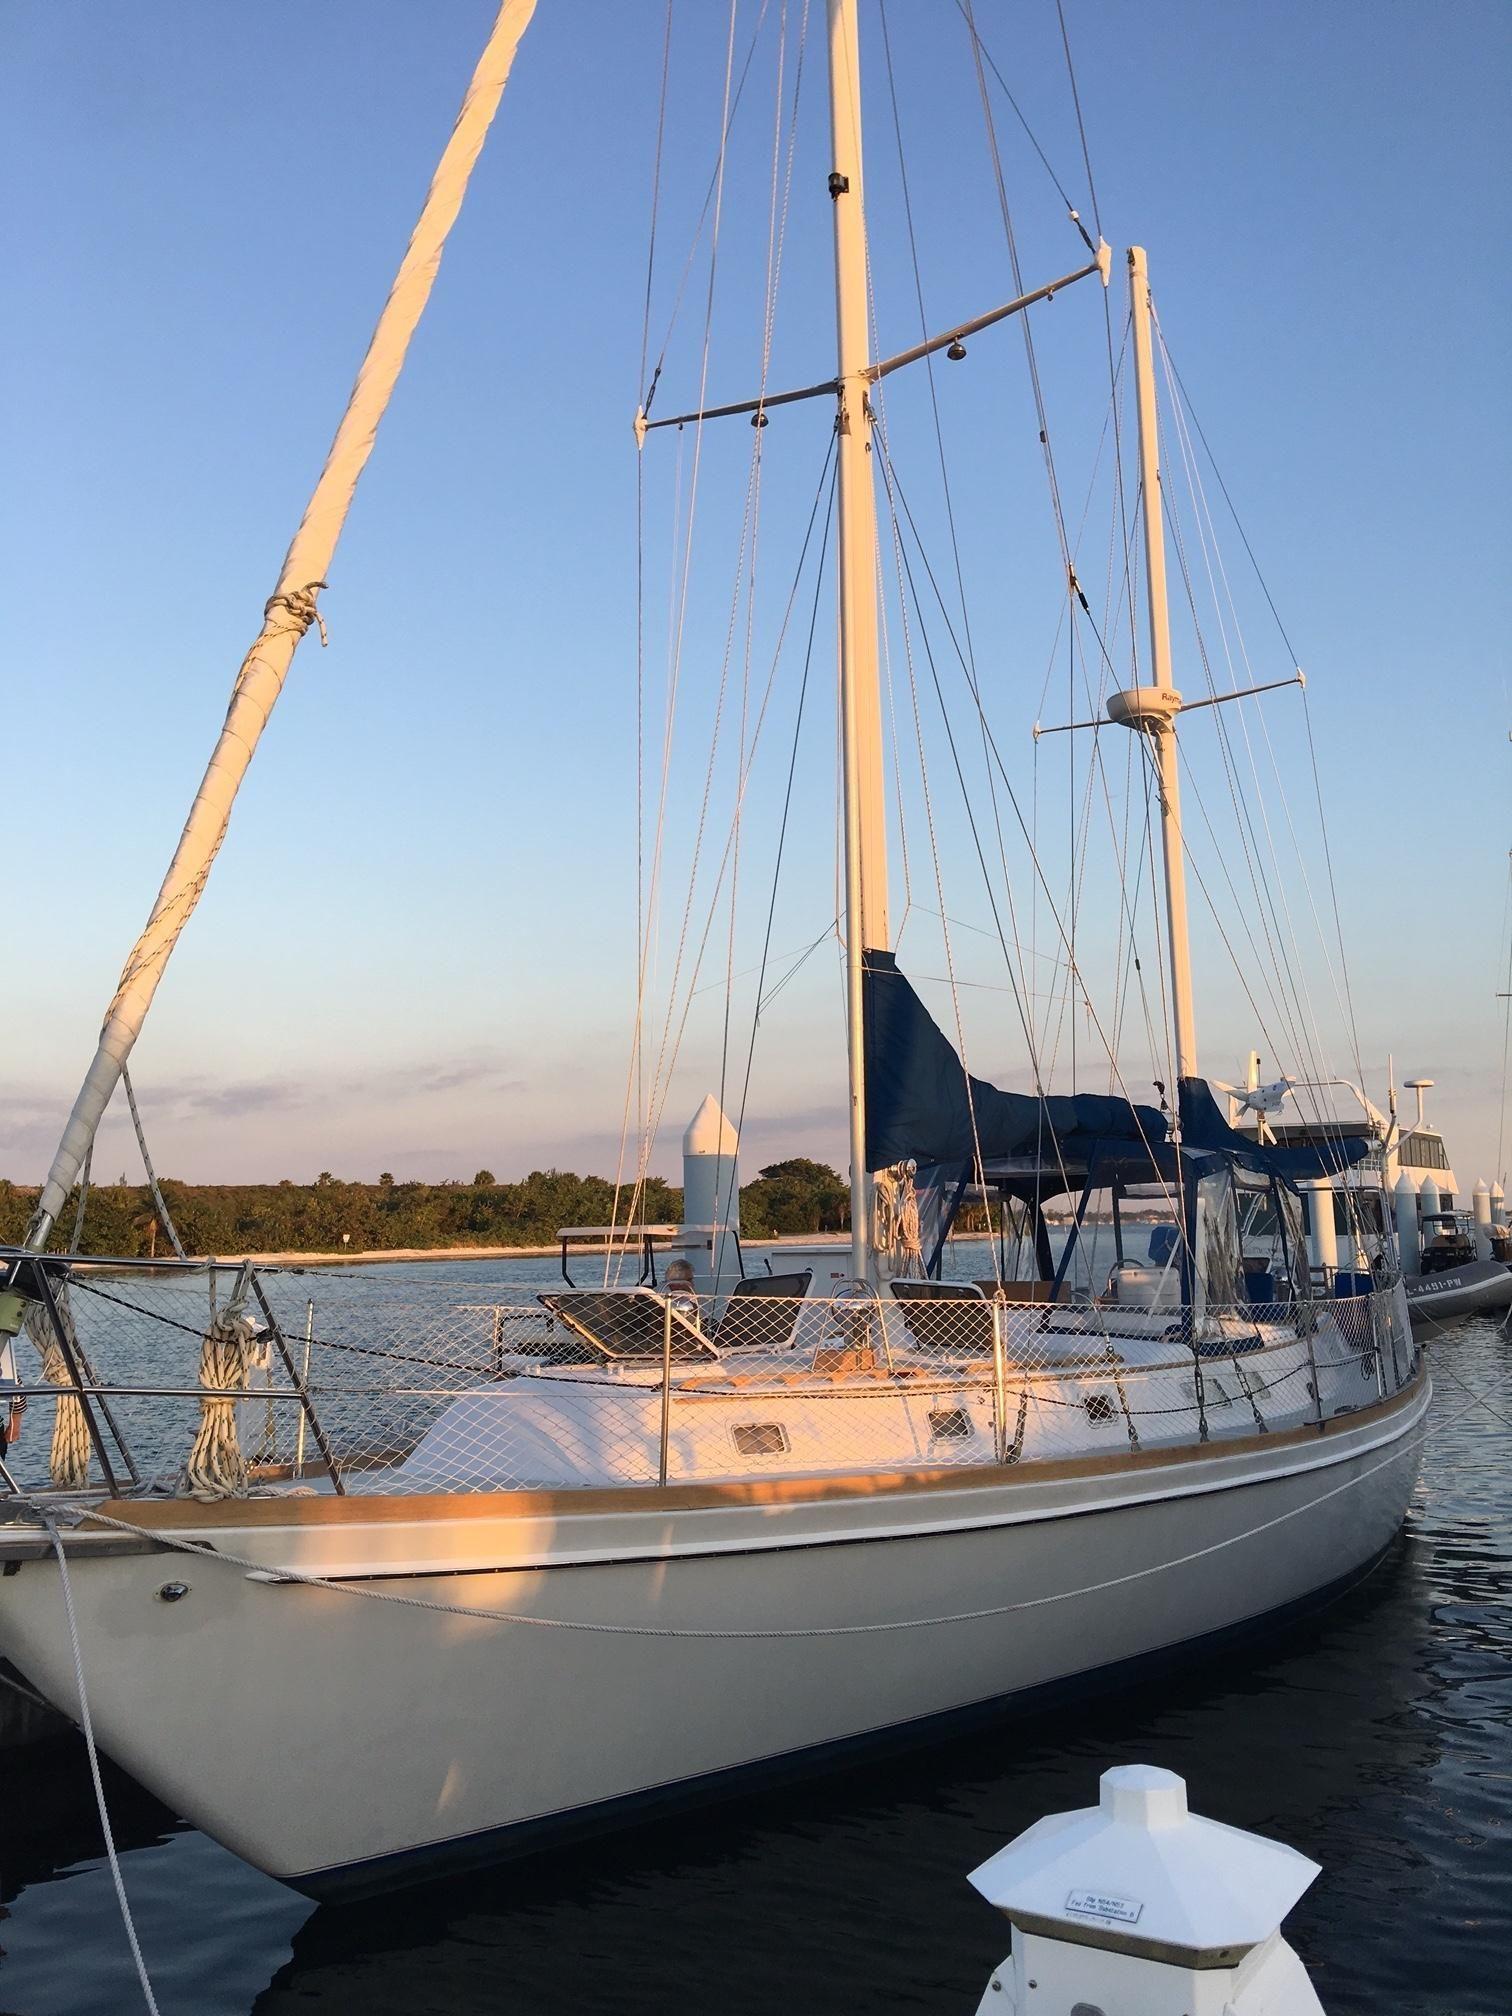 1980 Gulfstar 50 ft Ketch Sail Boat For Sale - www